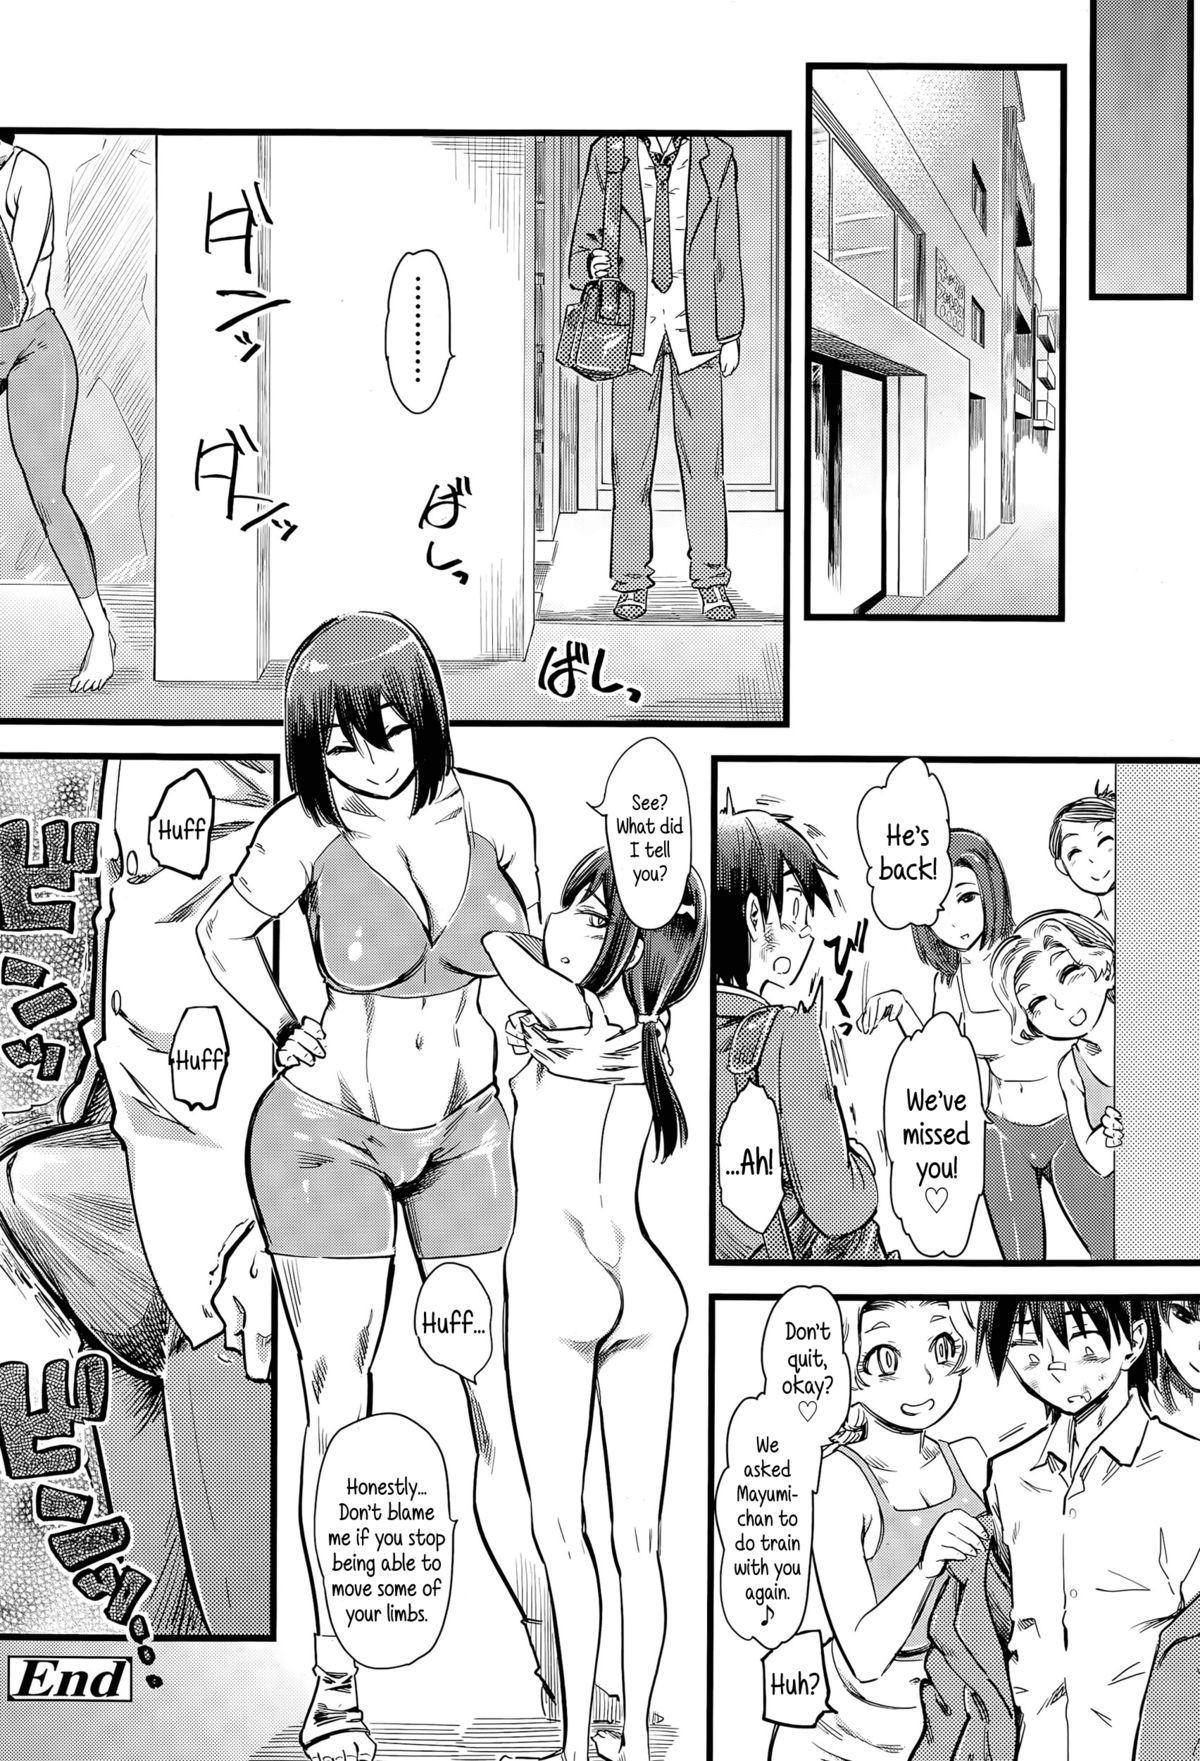 Body ga Garaaki | Your Body's Wide Open 23